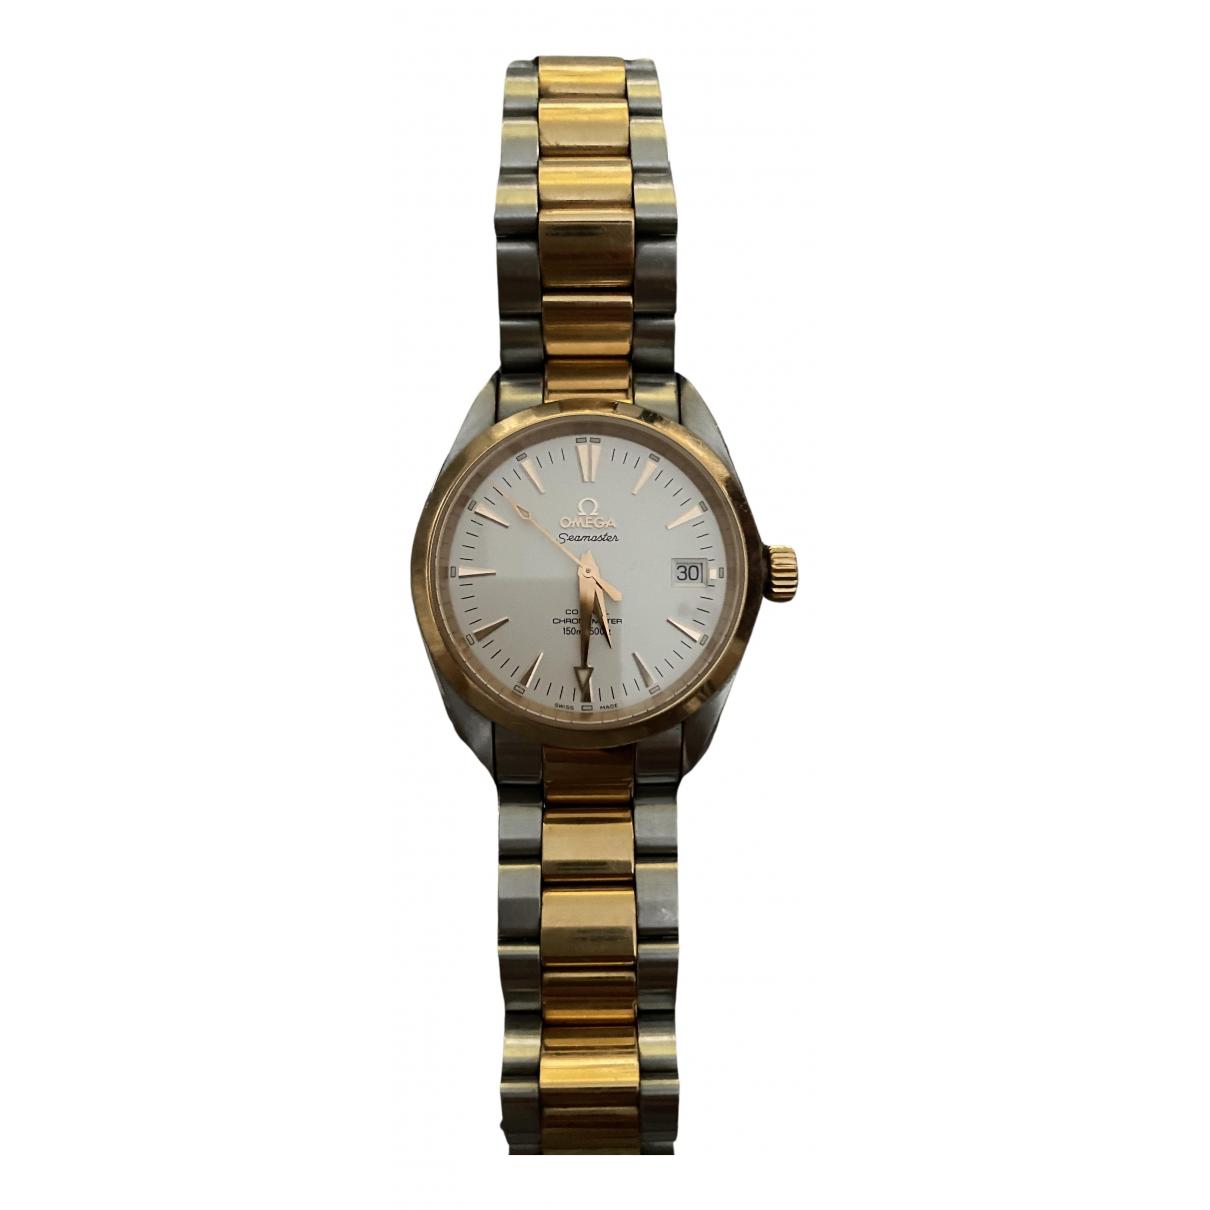 Omega Seamaster Aquaterra Uhr in Gold und Stahl